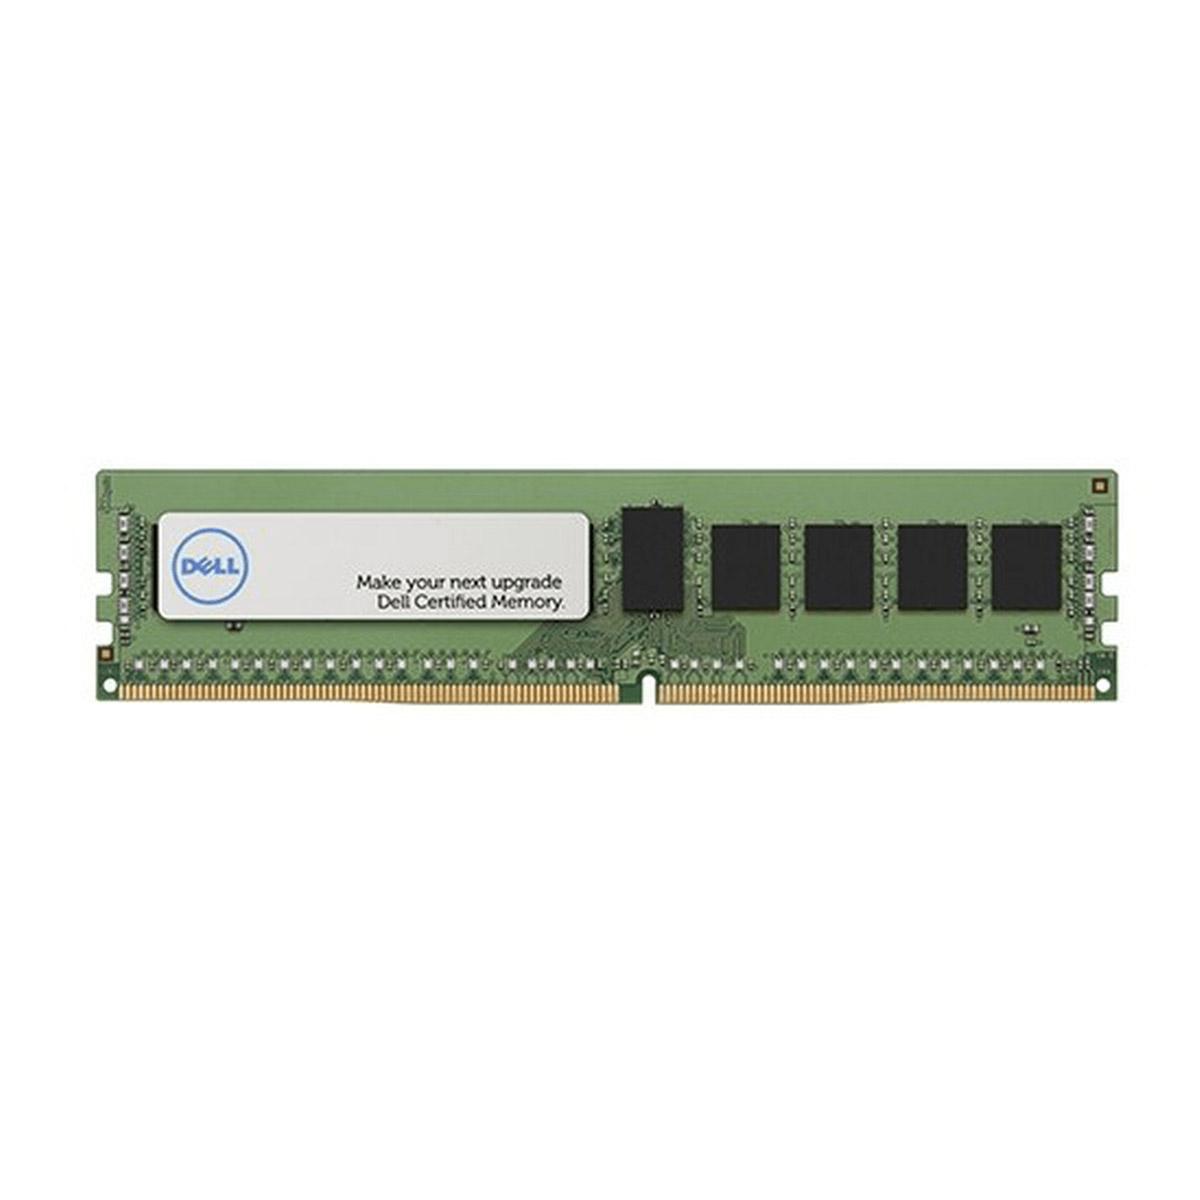 Memoria Dell 8GB 1Rx8 DDR4 UDIMM 2666MHz ECC AA358200